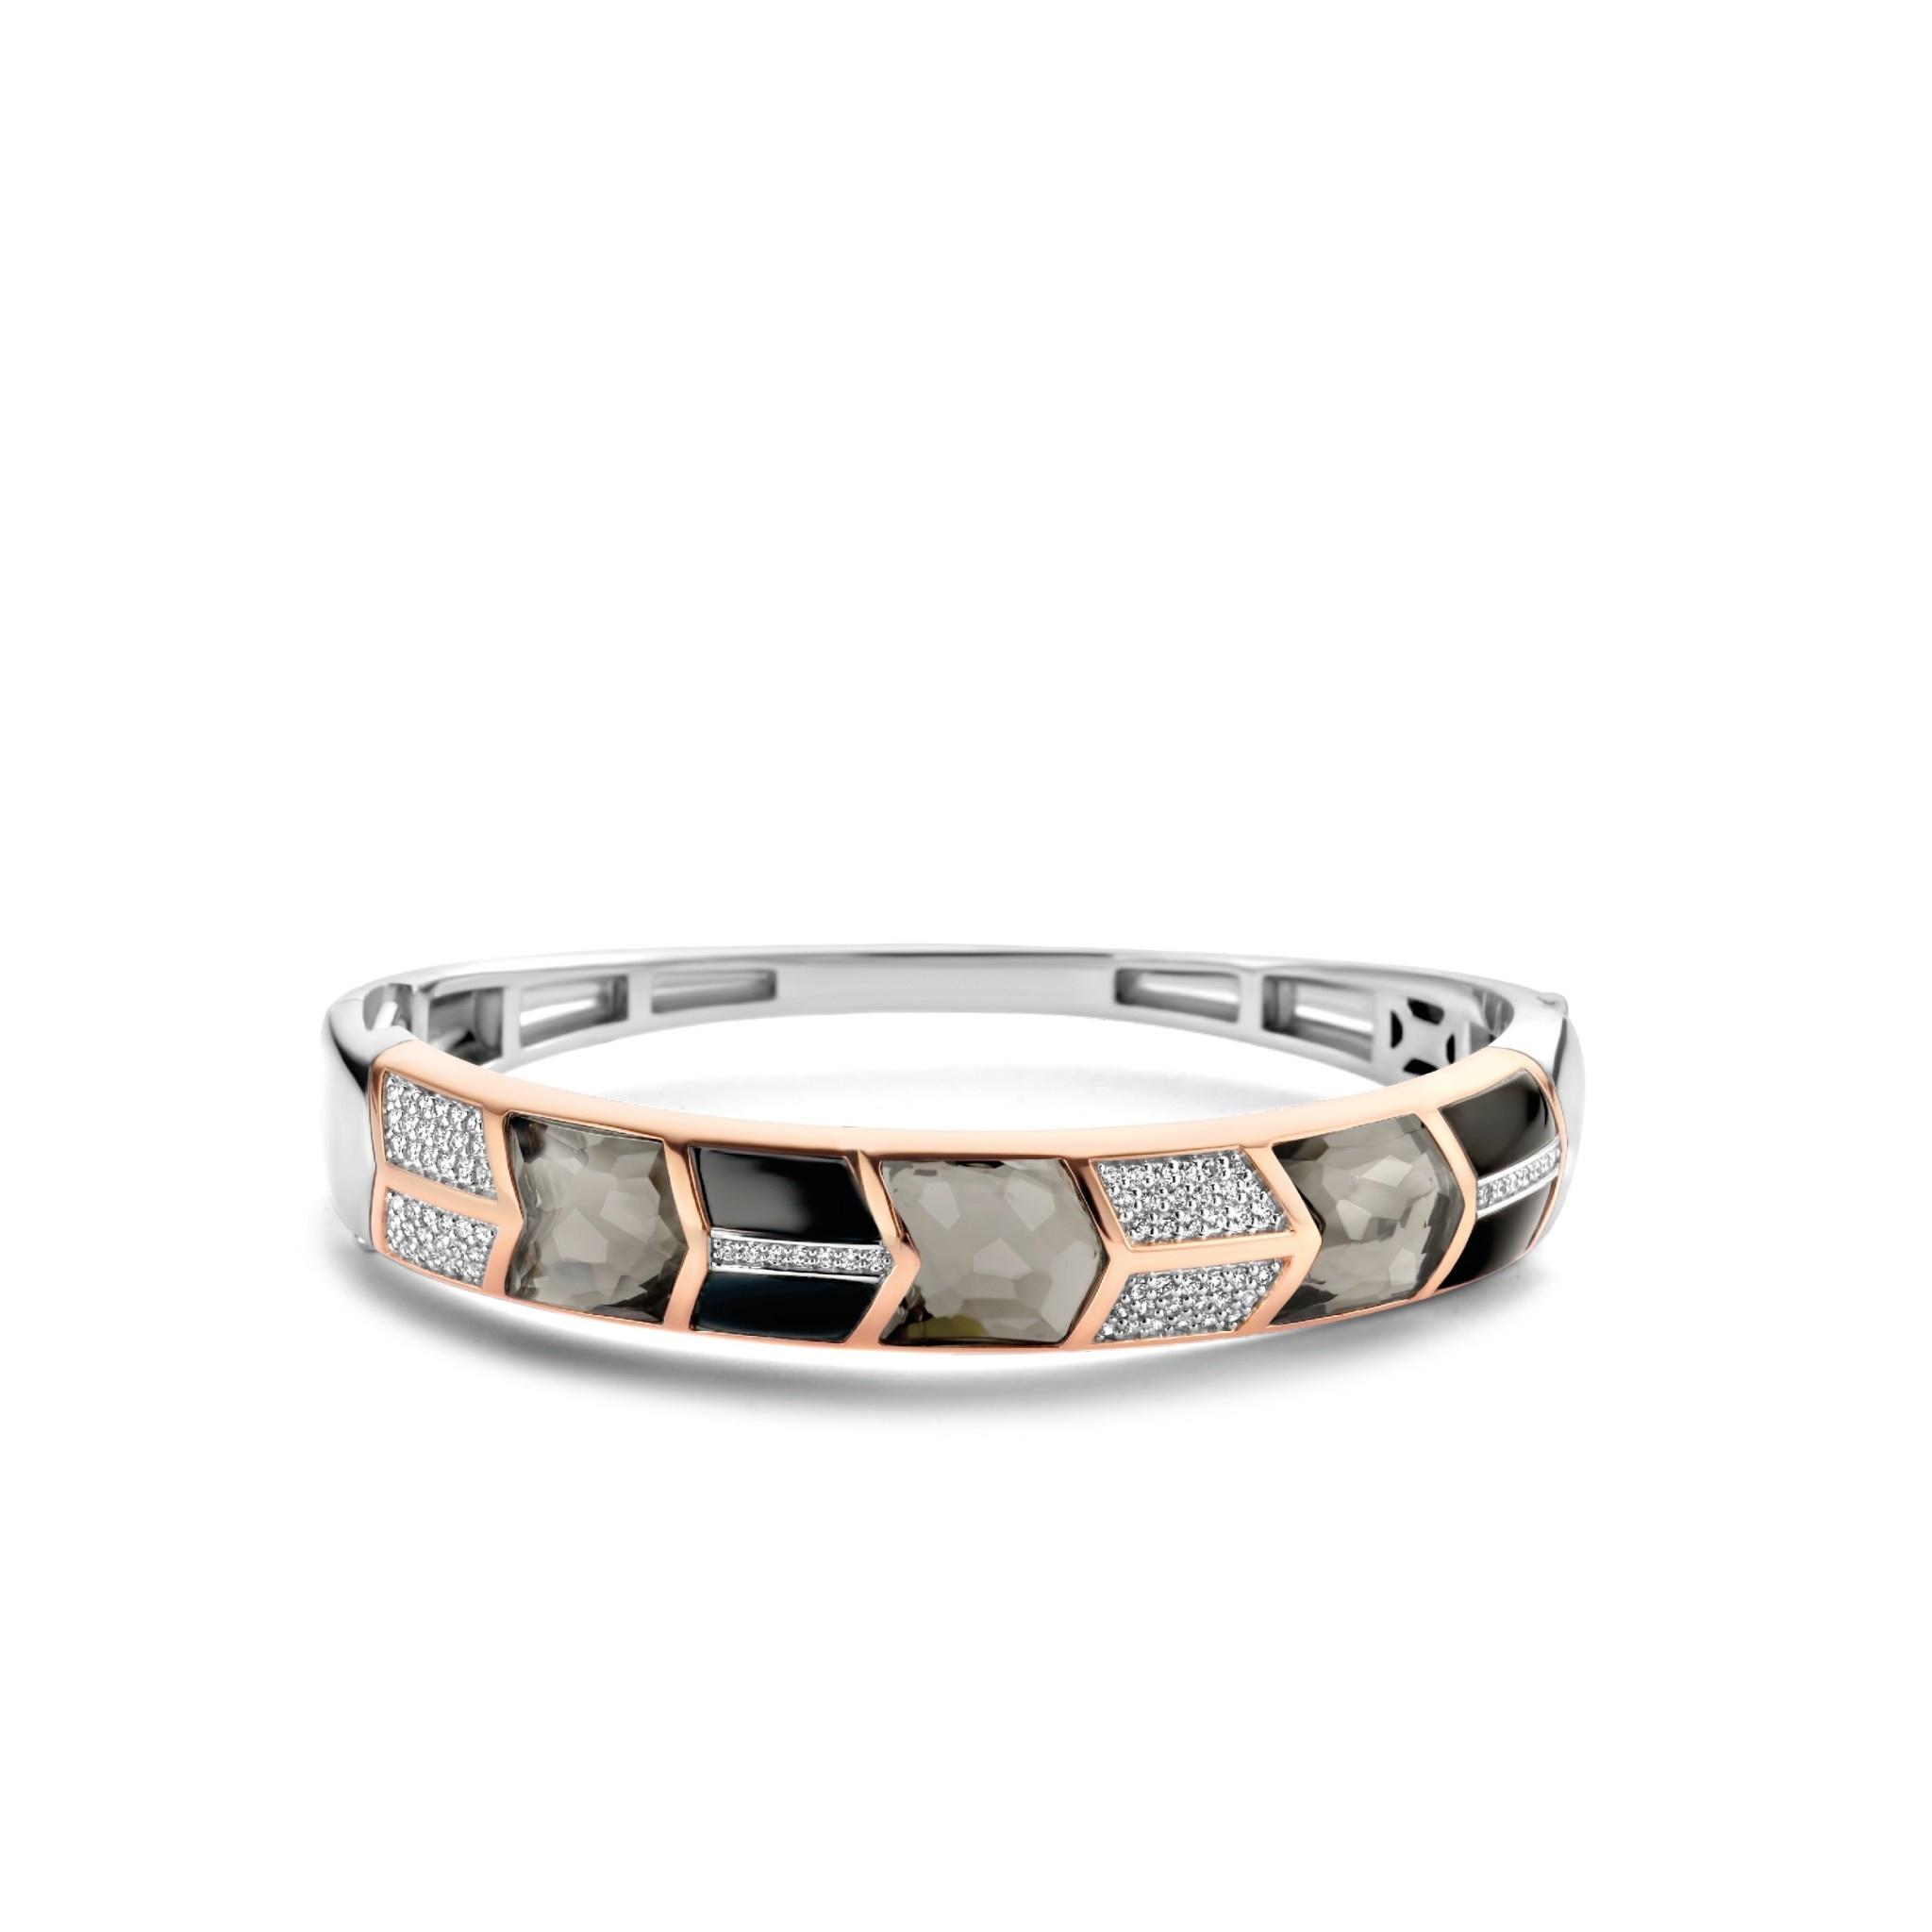 TI SENTO - Milano Armband 2946GB-1